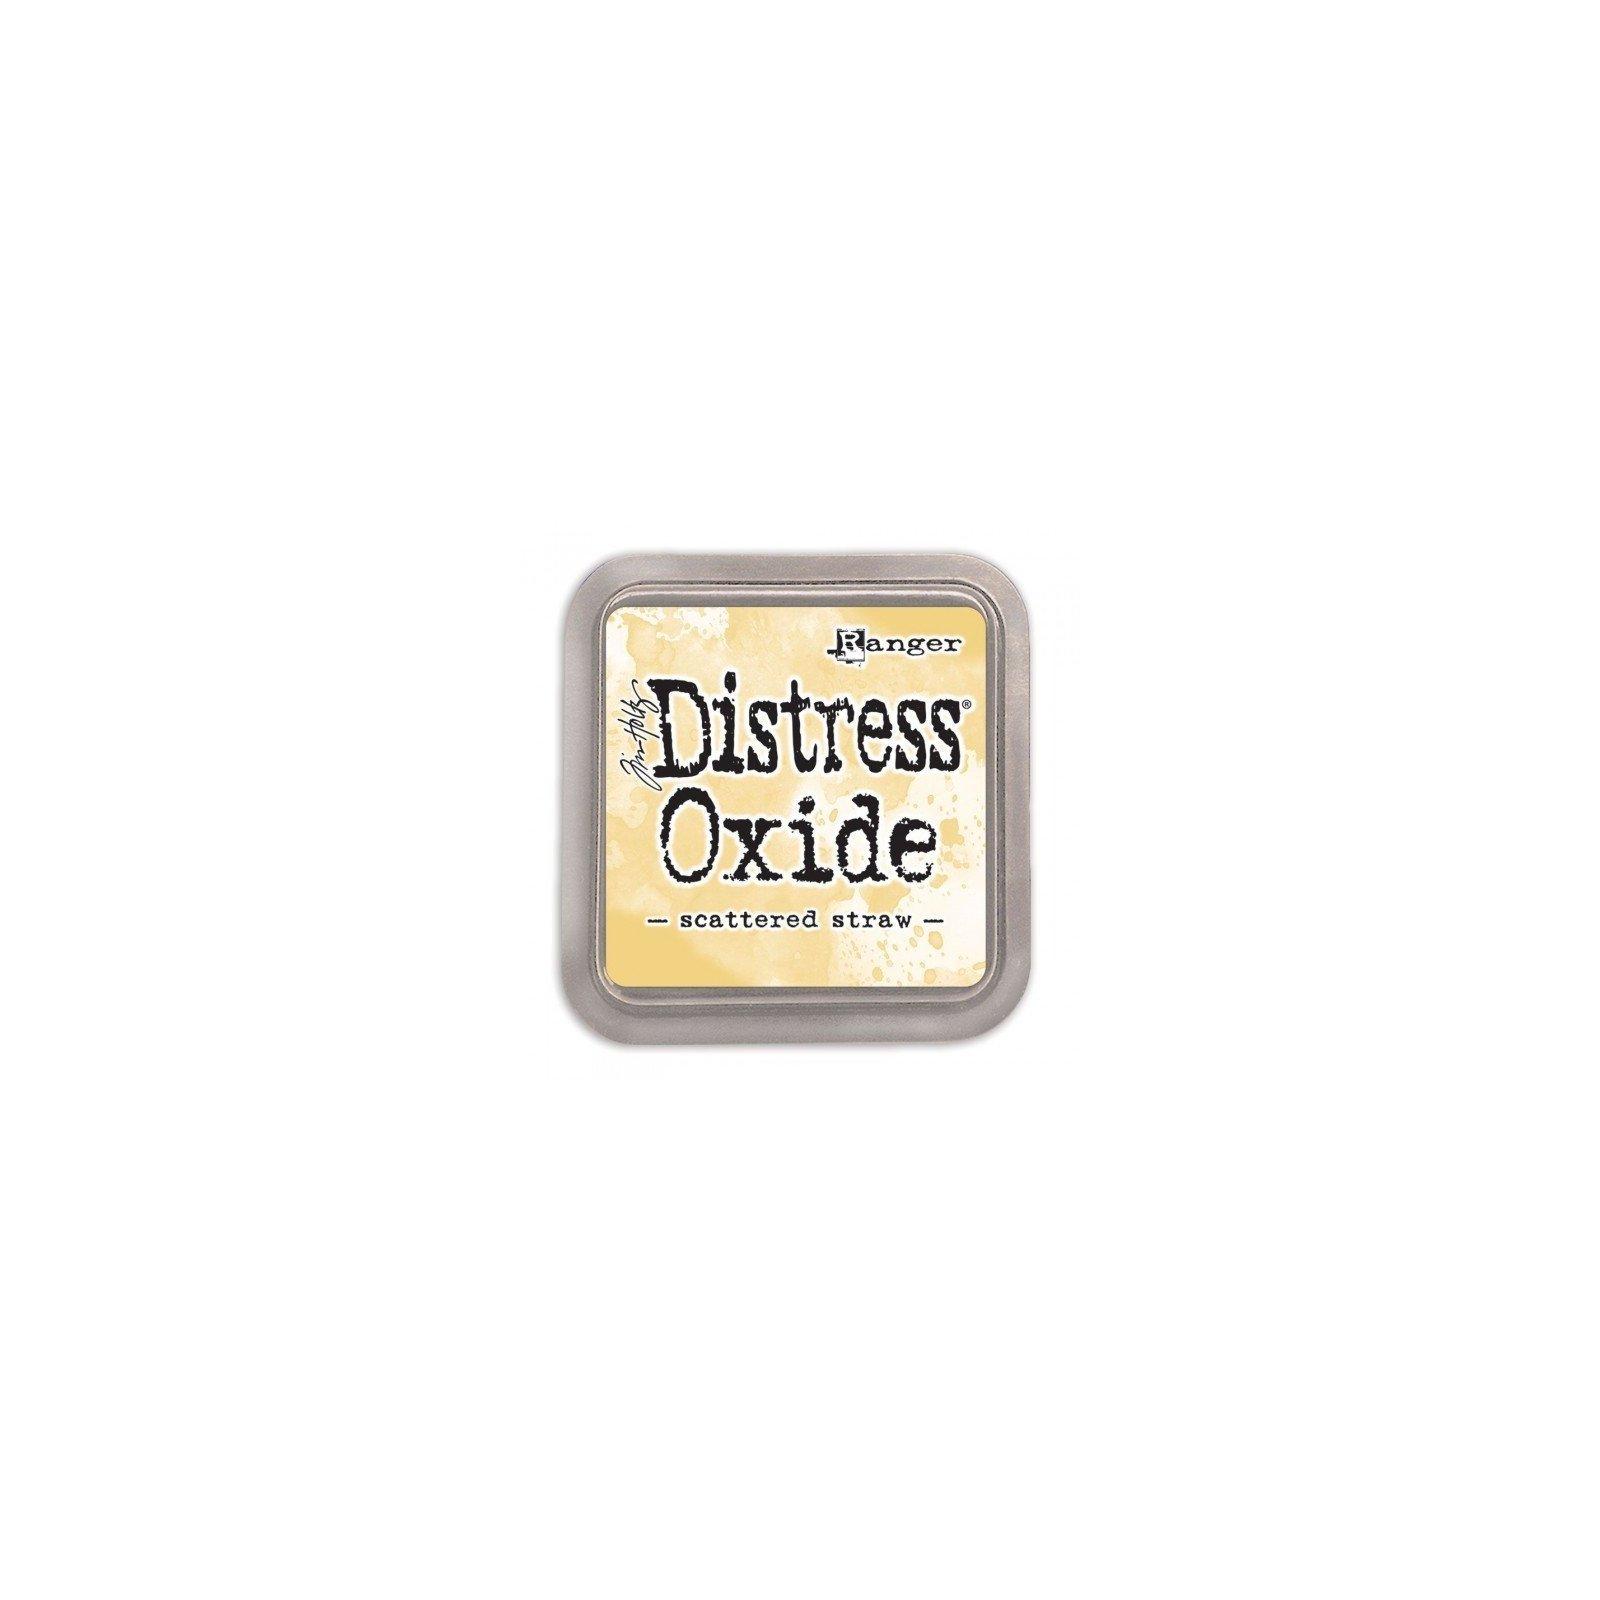 Grand encreur jaune Distress Oxide - Scattered Straw - Ranger